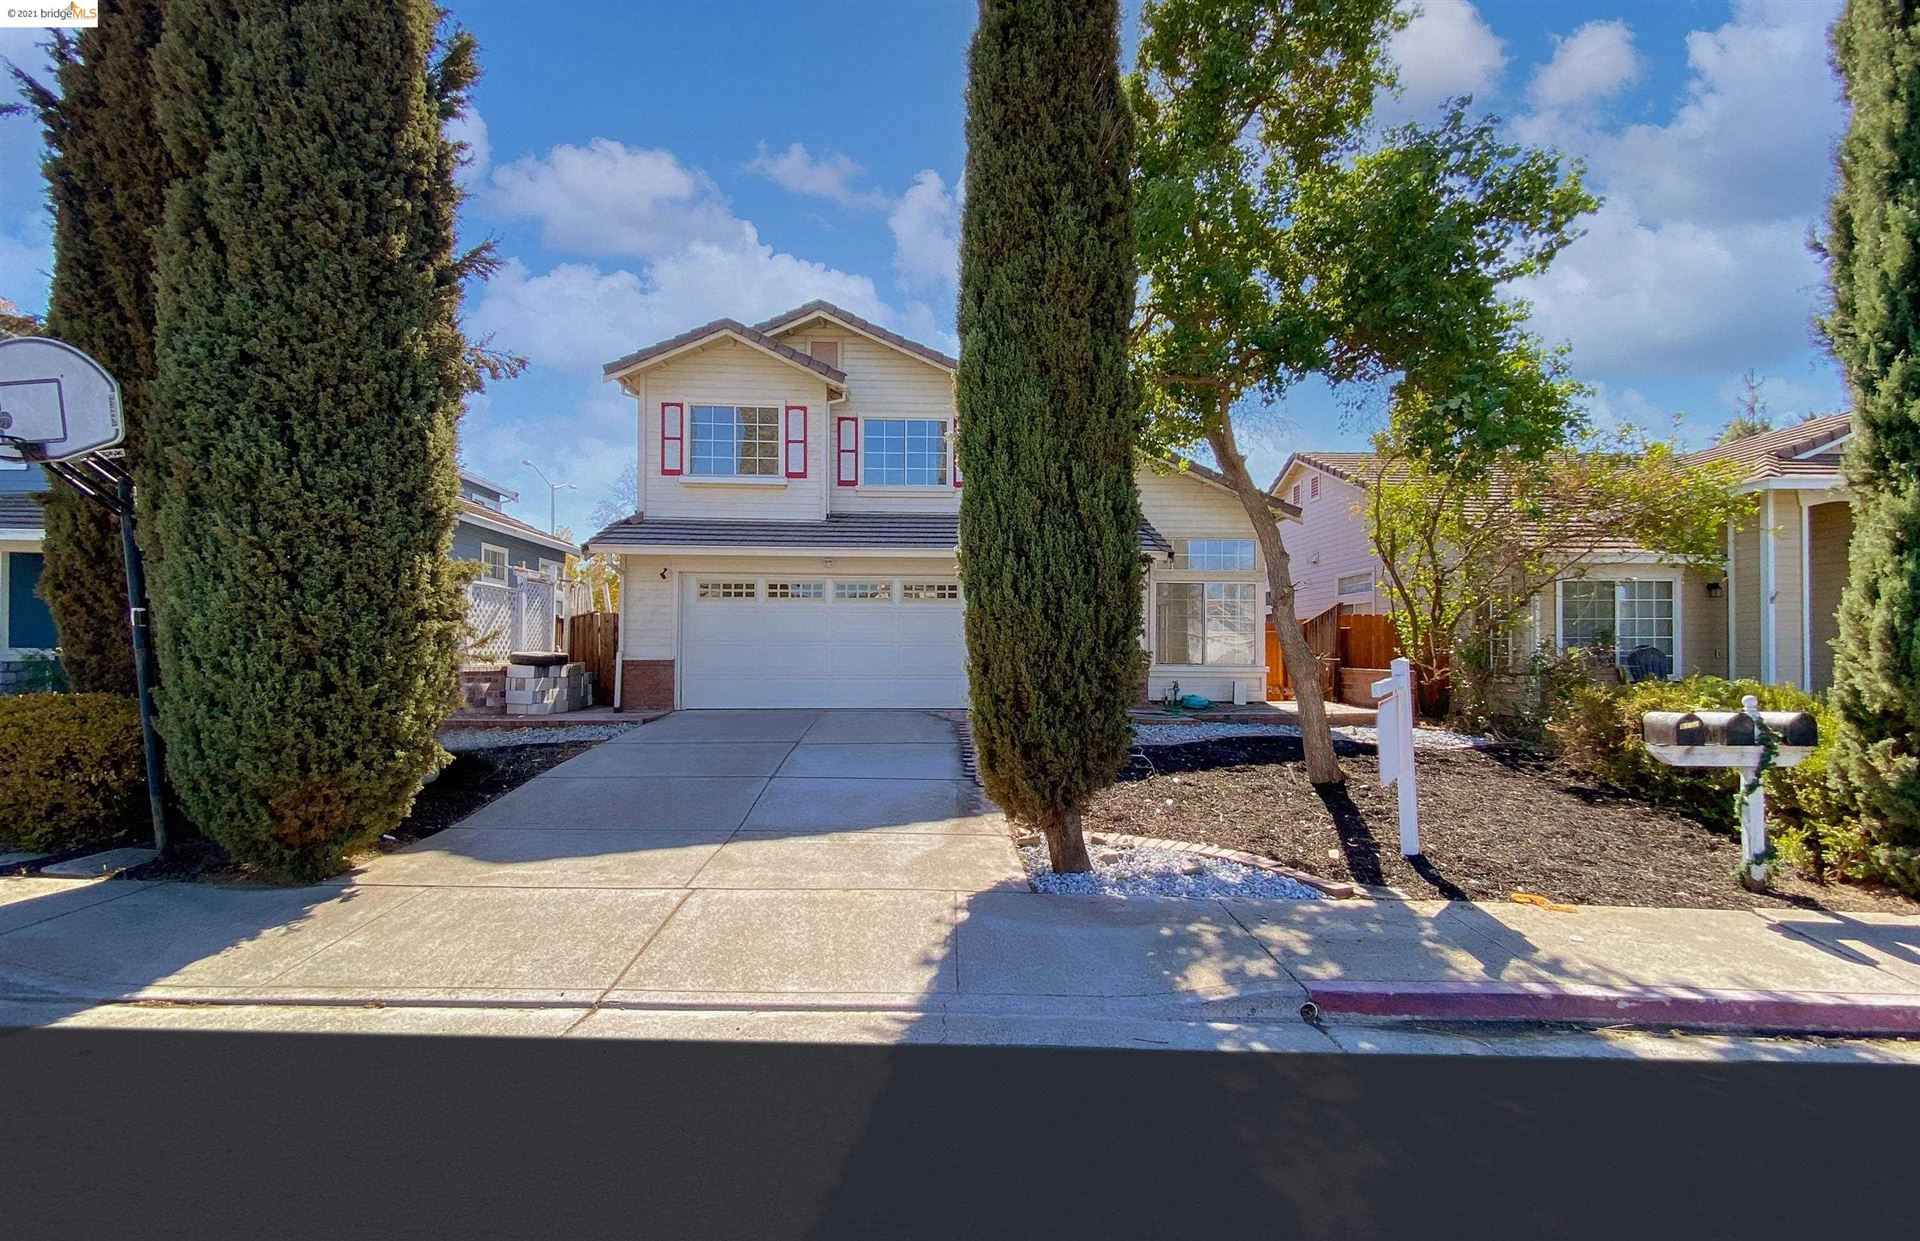 Photo of 5128 Brookcrest Ct, Antioch, CA 94531 (MLS # 40970388)